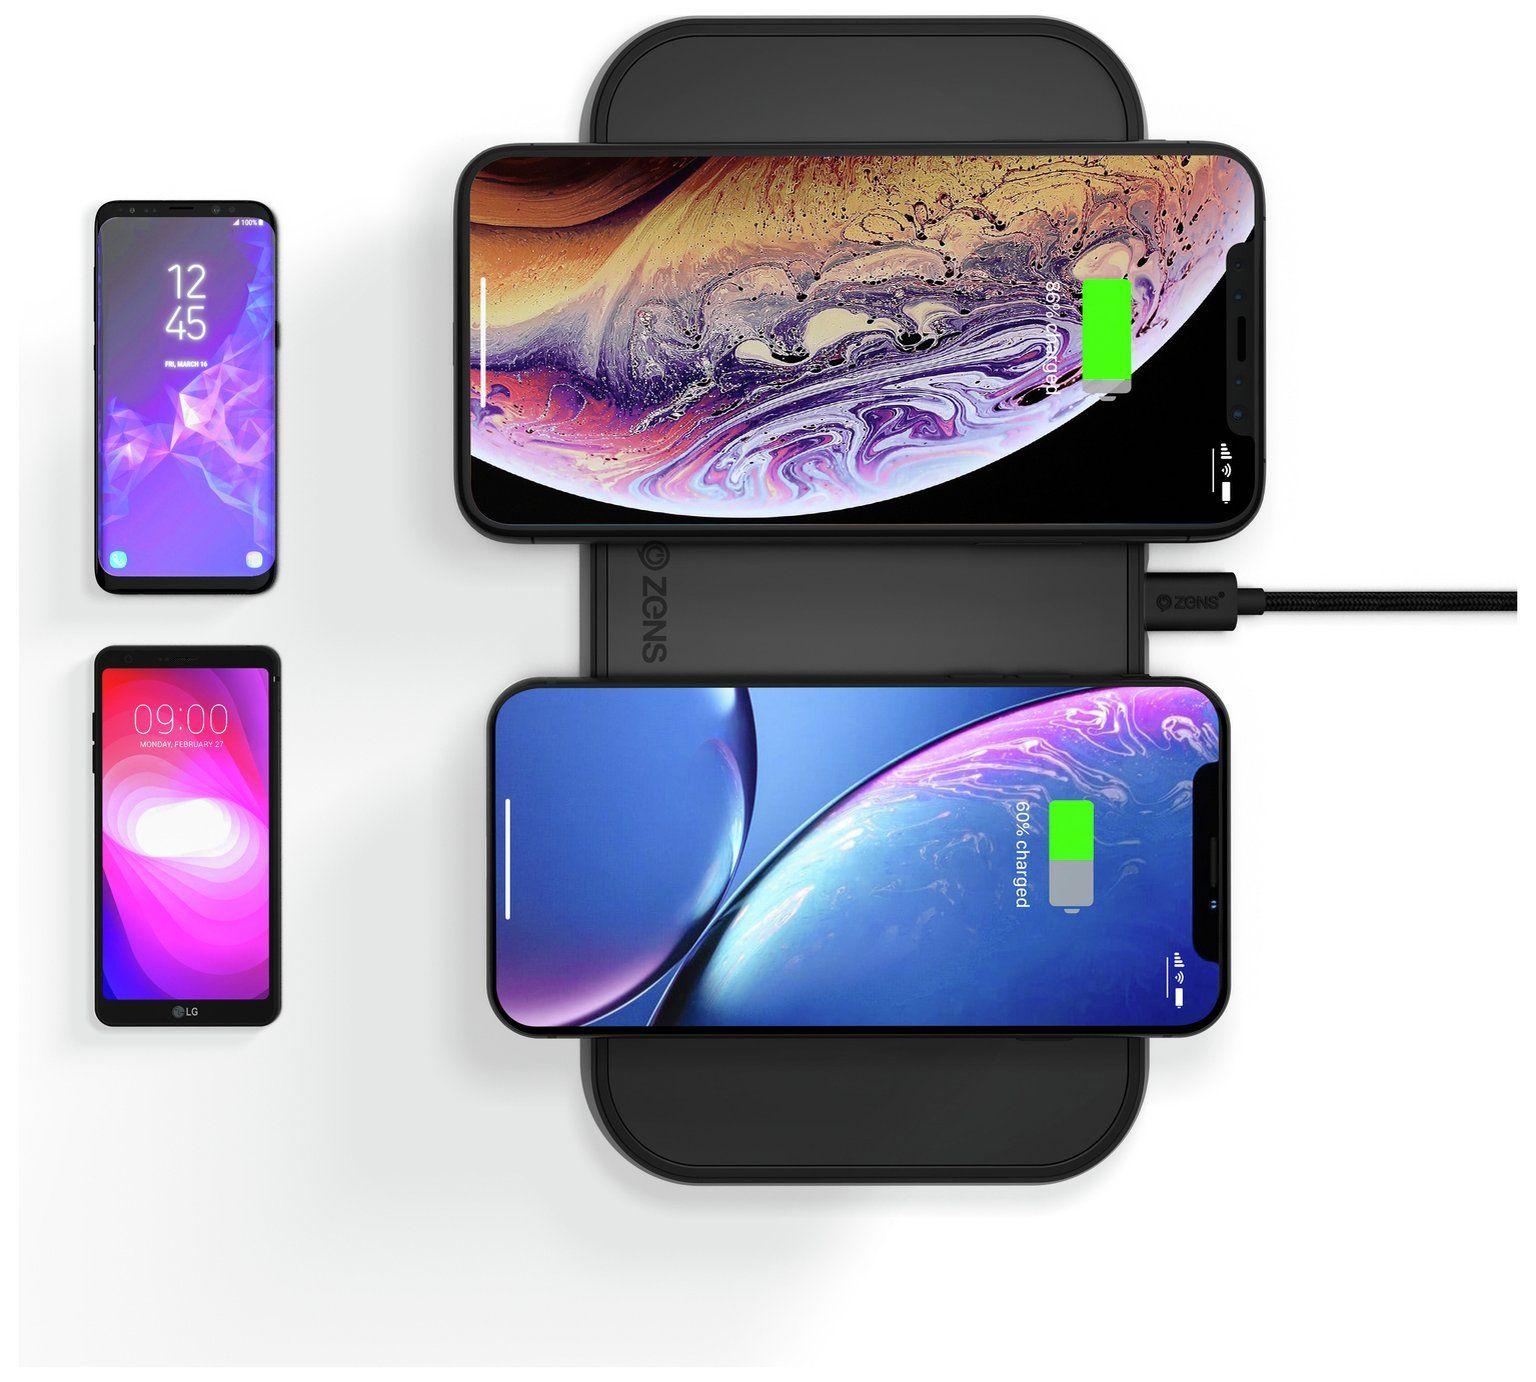 Výsledek obrázku pro ZENS Dual Ultra Fast Wireless Charger